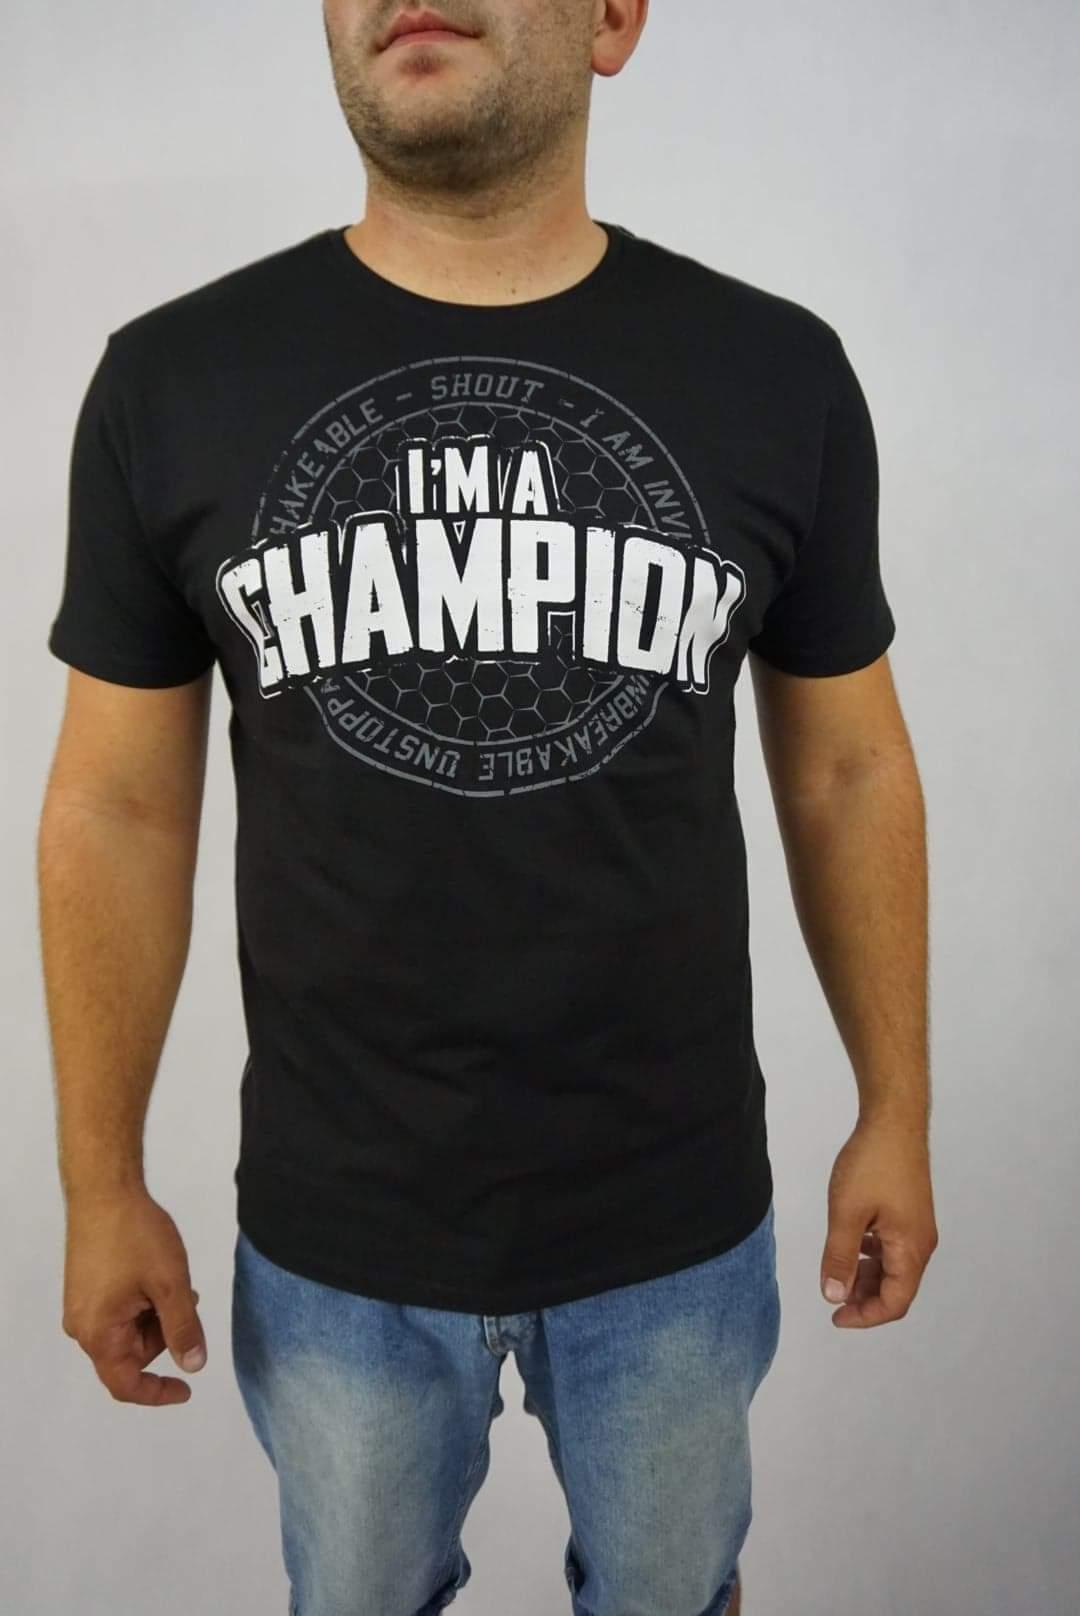 SHOUT T-SHIRT I'M A CHAMPION BLACK